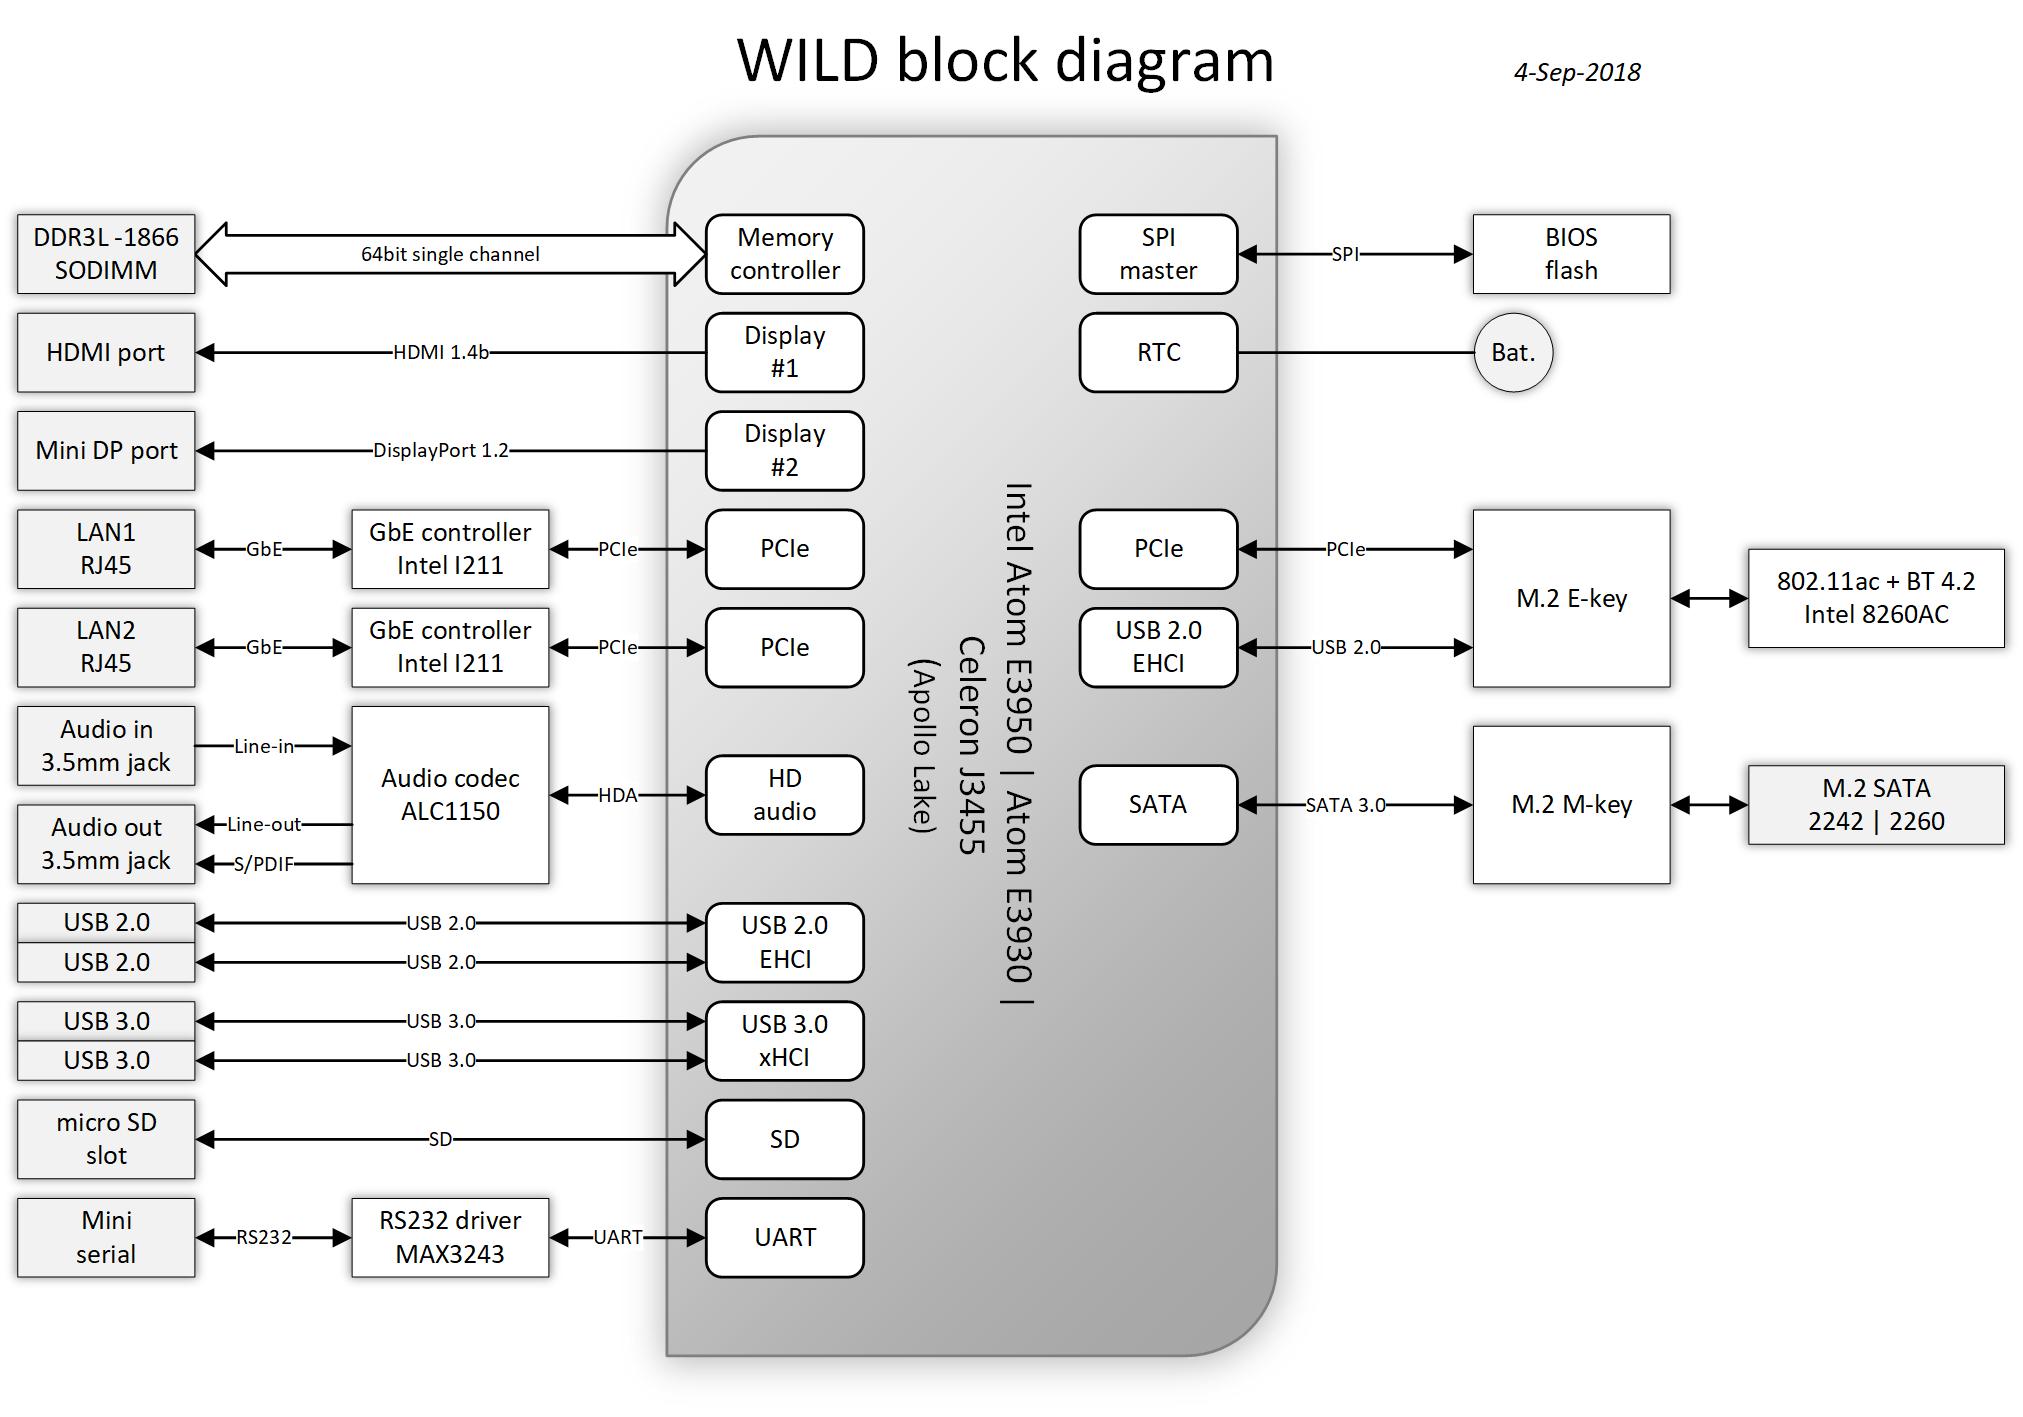 Compulab Wild Wifi Router Supports Wifi Rtt  802 11mc